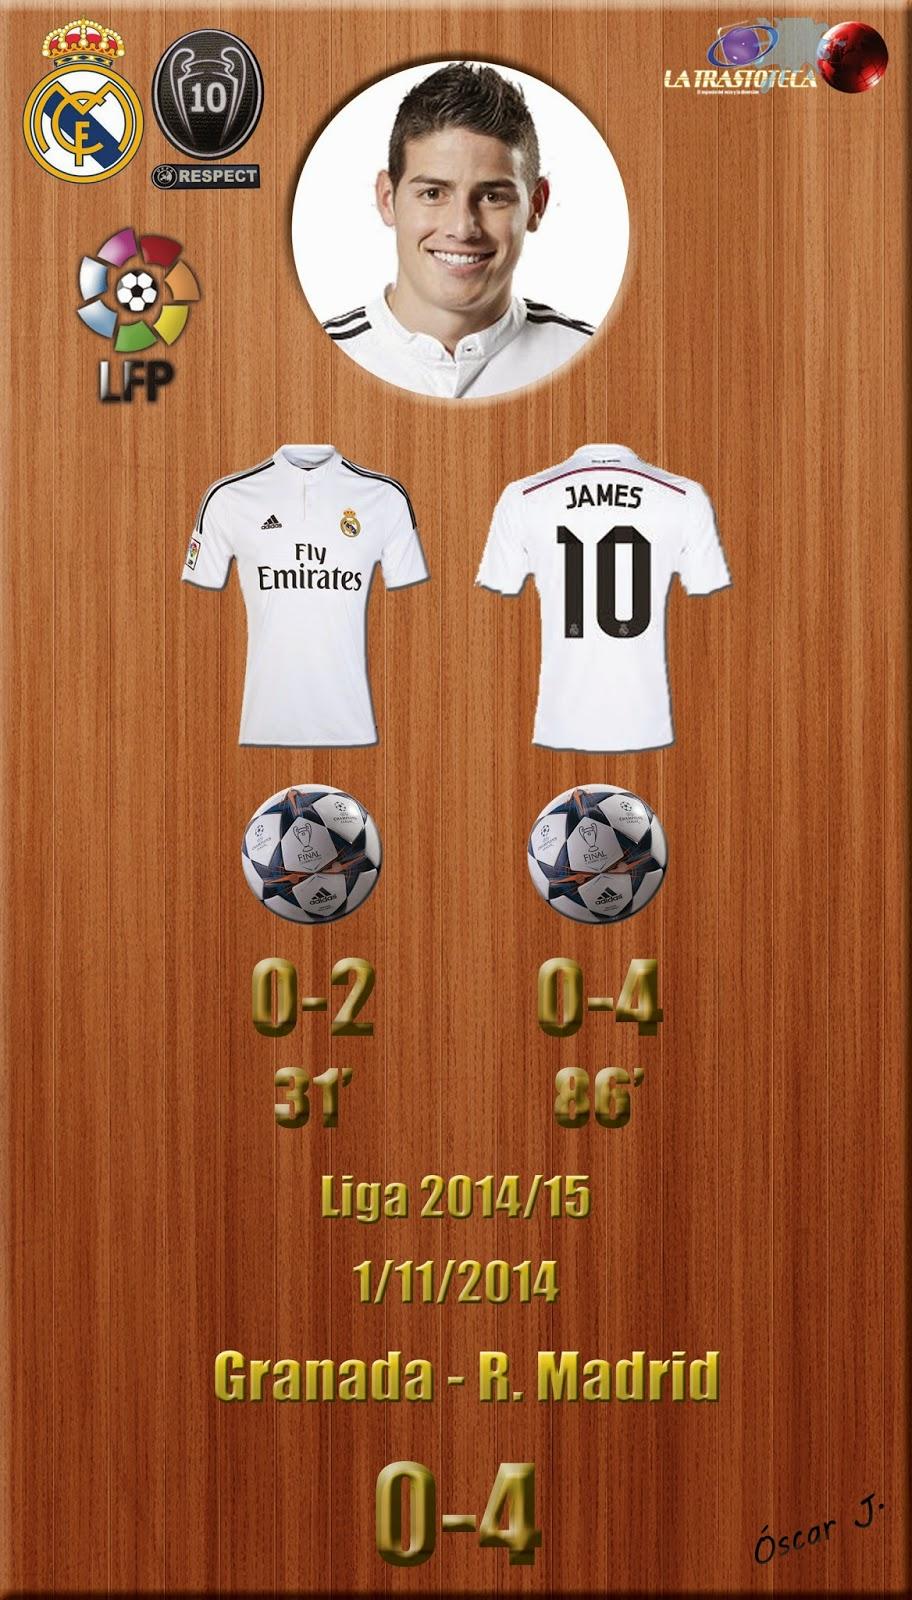 James - (doblete) - Granada 0-4 Real Madrid - Liga 2014/15 - (1/11/2014)